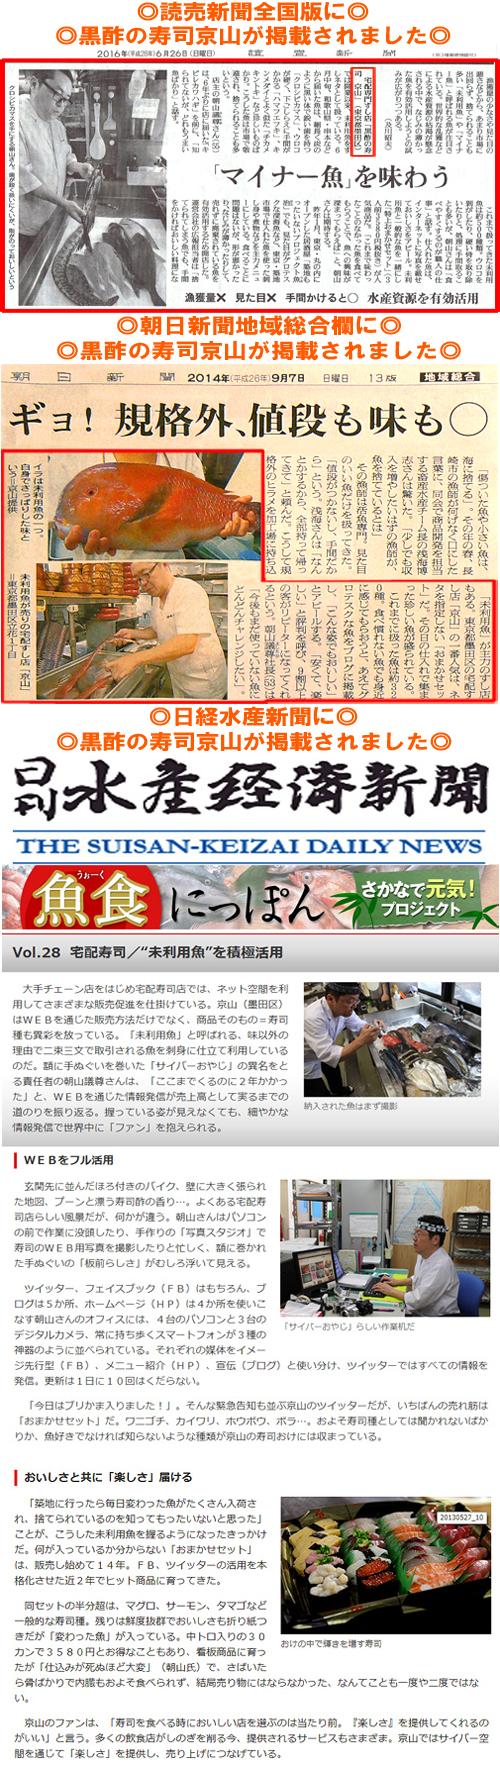 黒酢の寿司京山.jpg